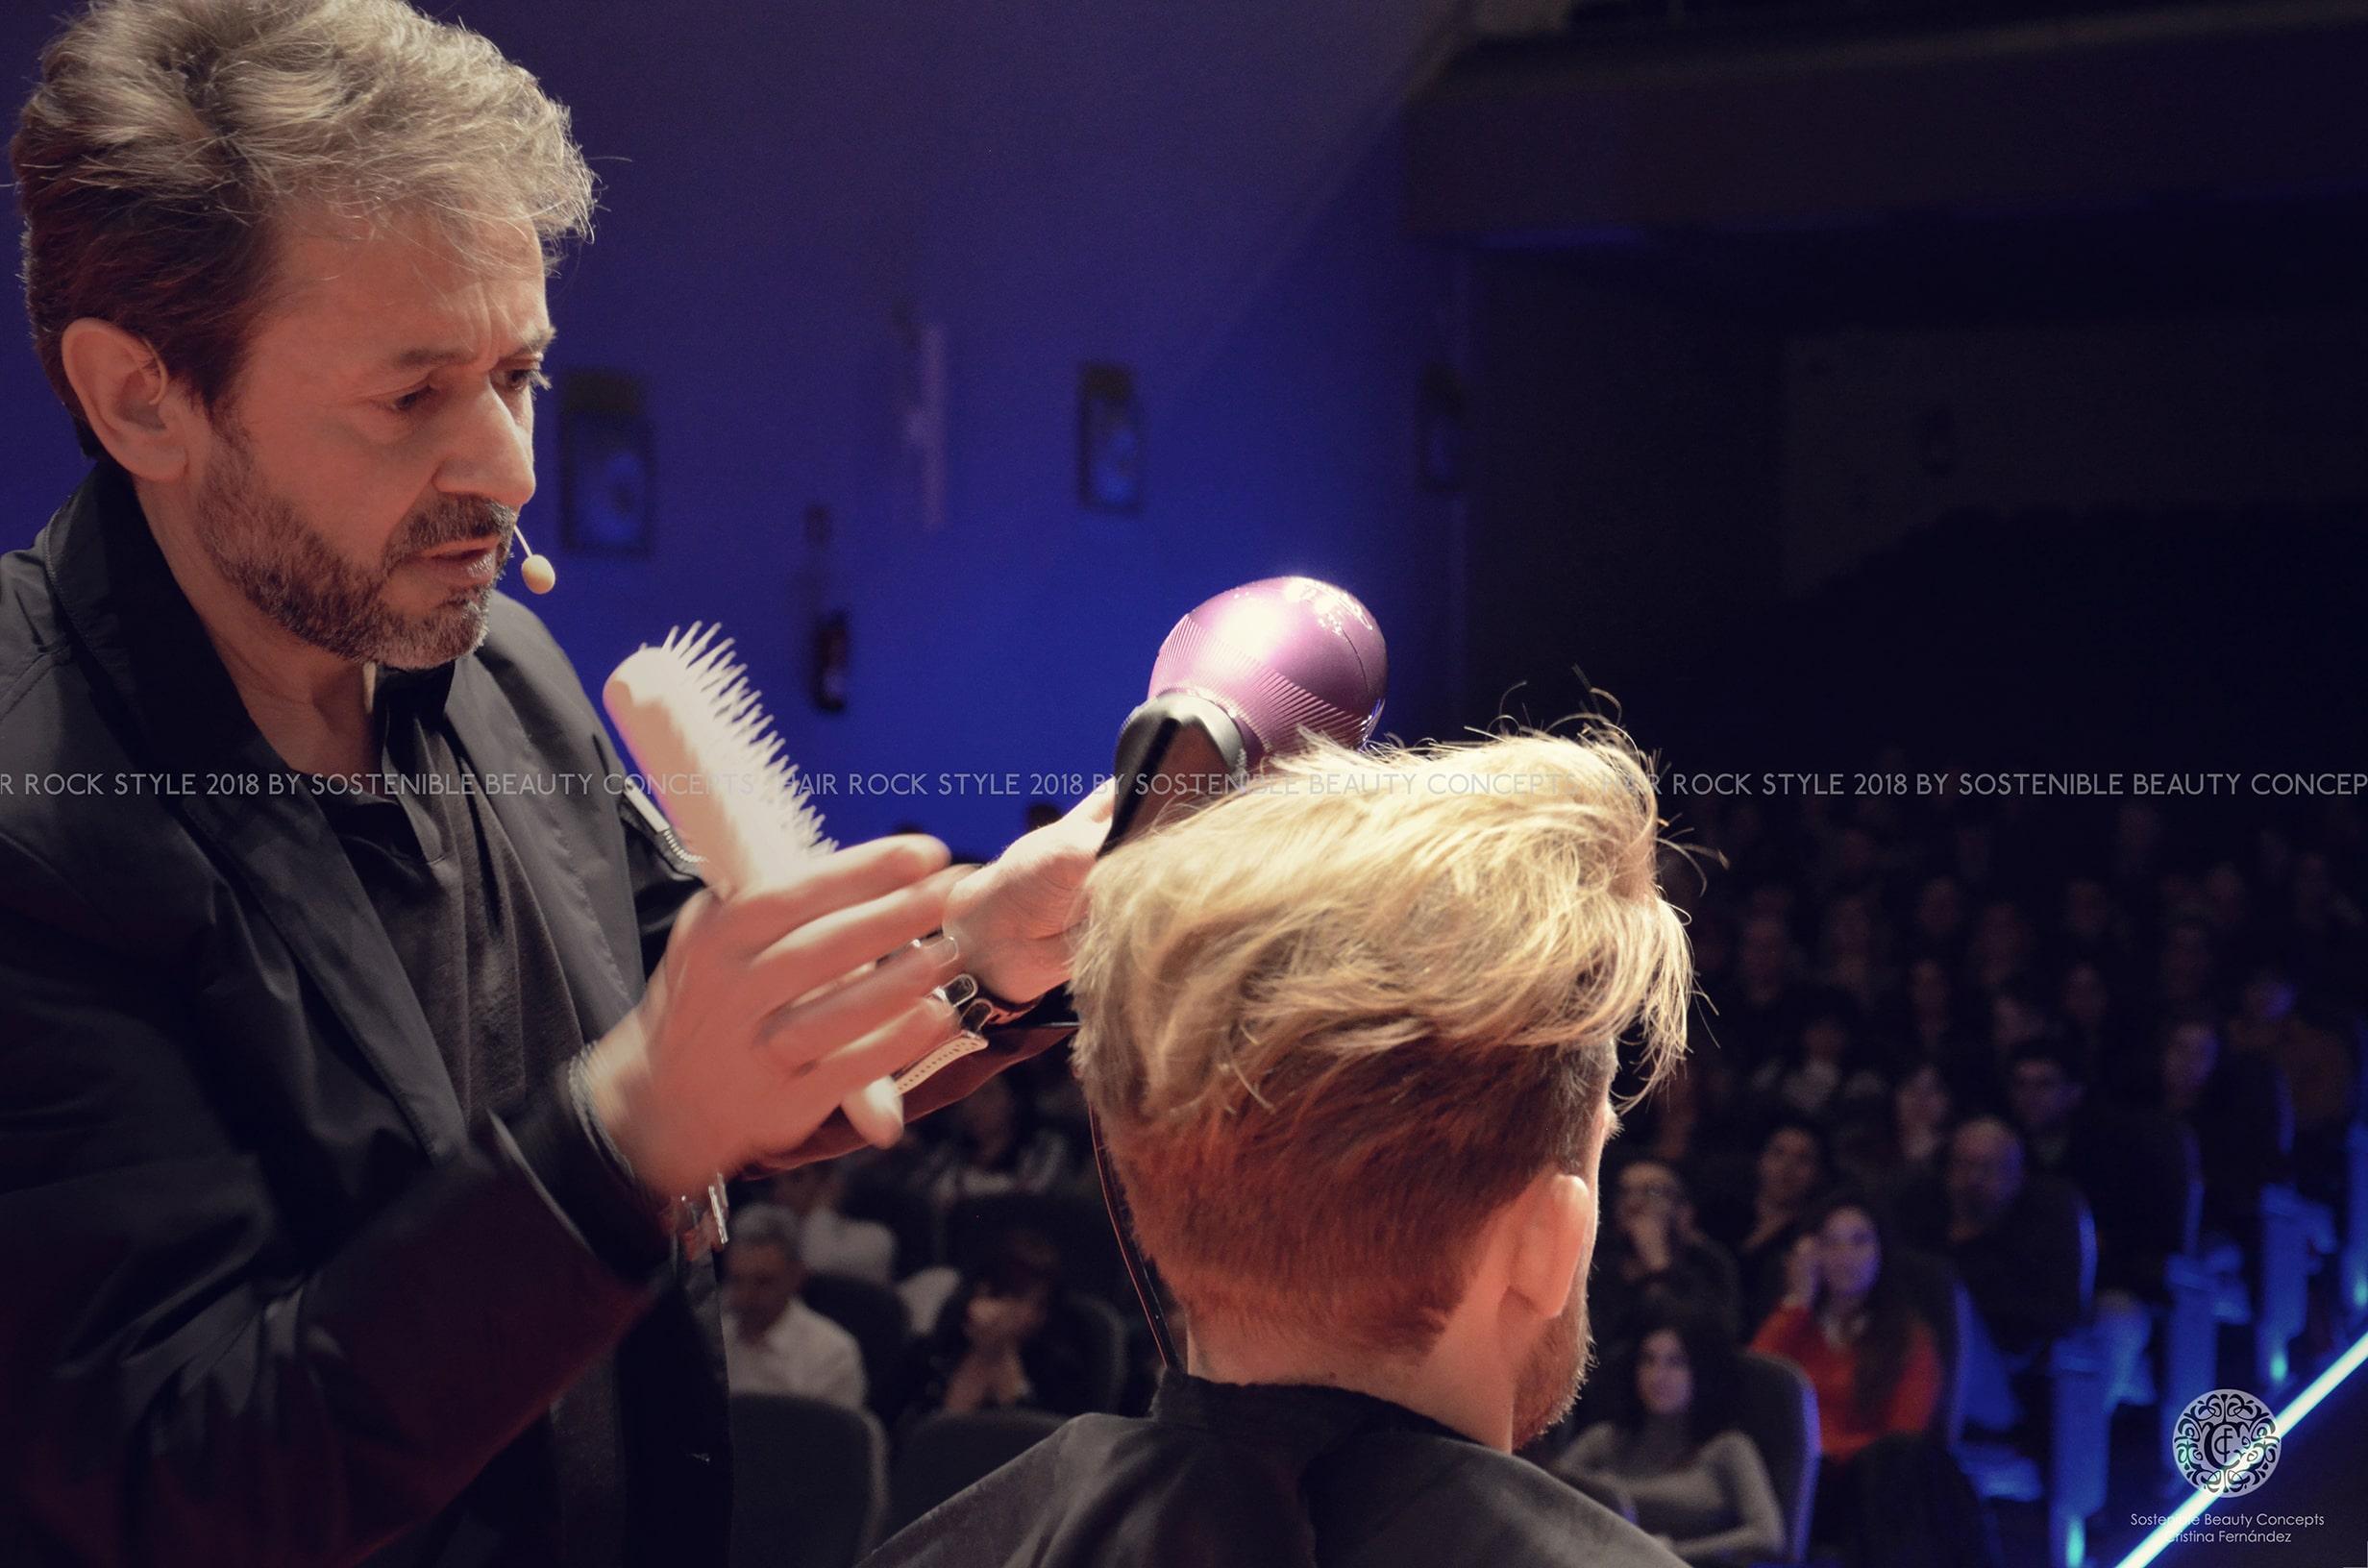 Hair rock style demostración